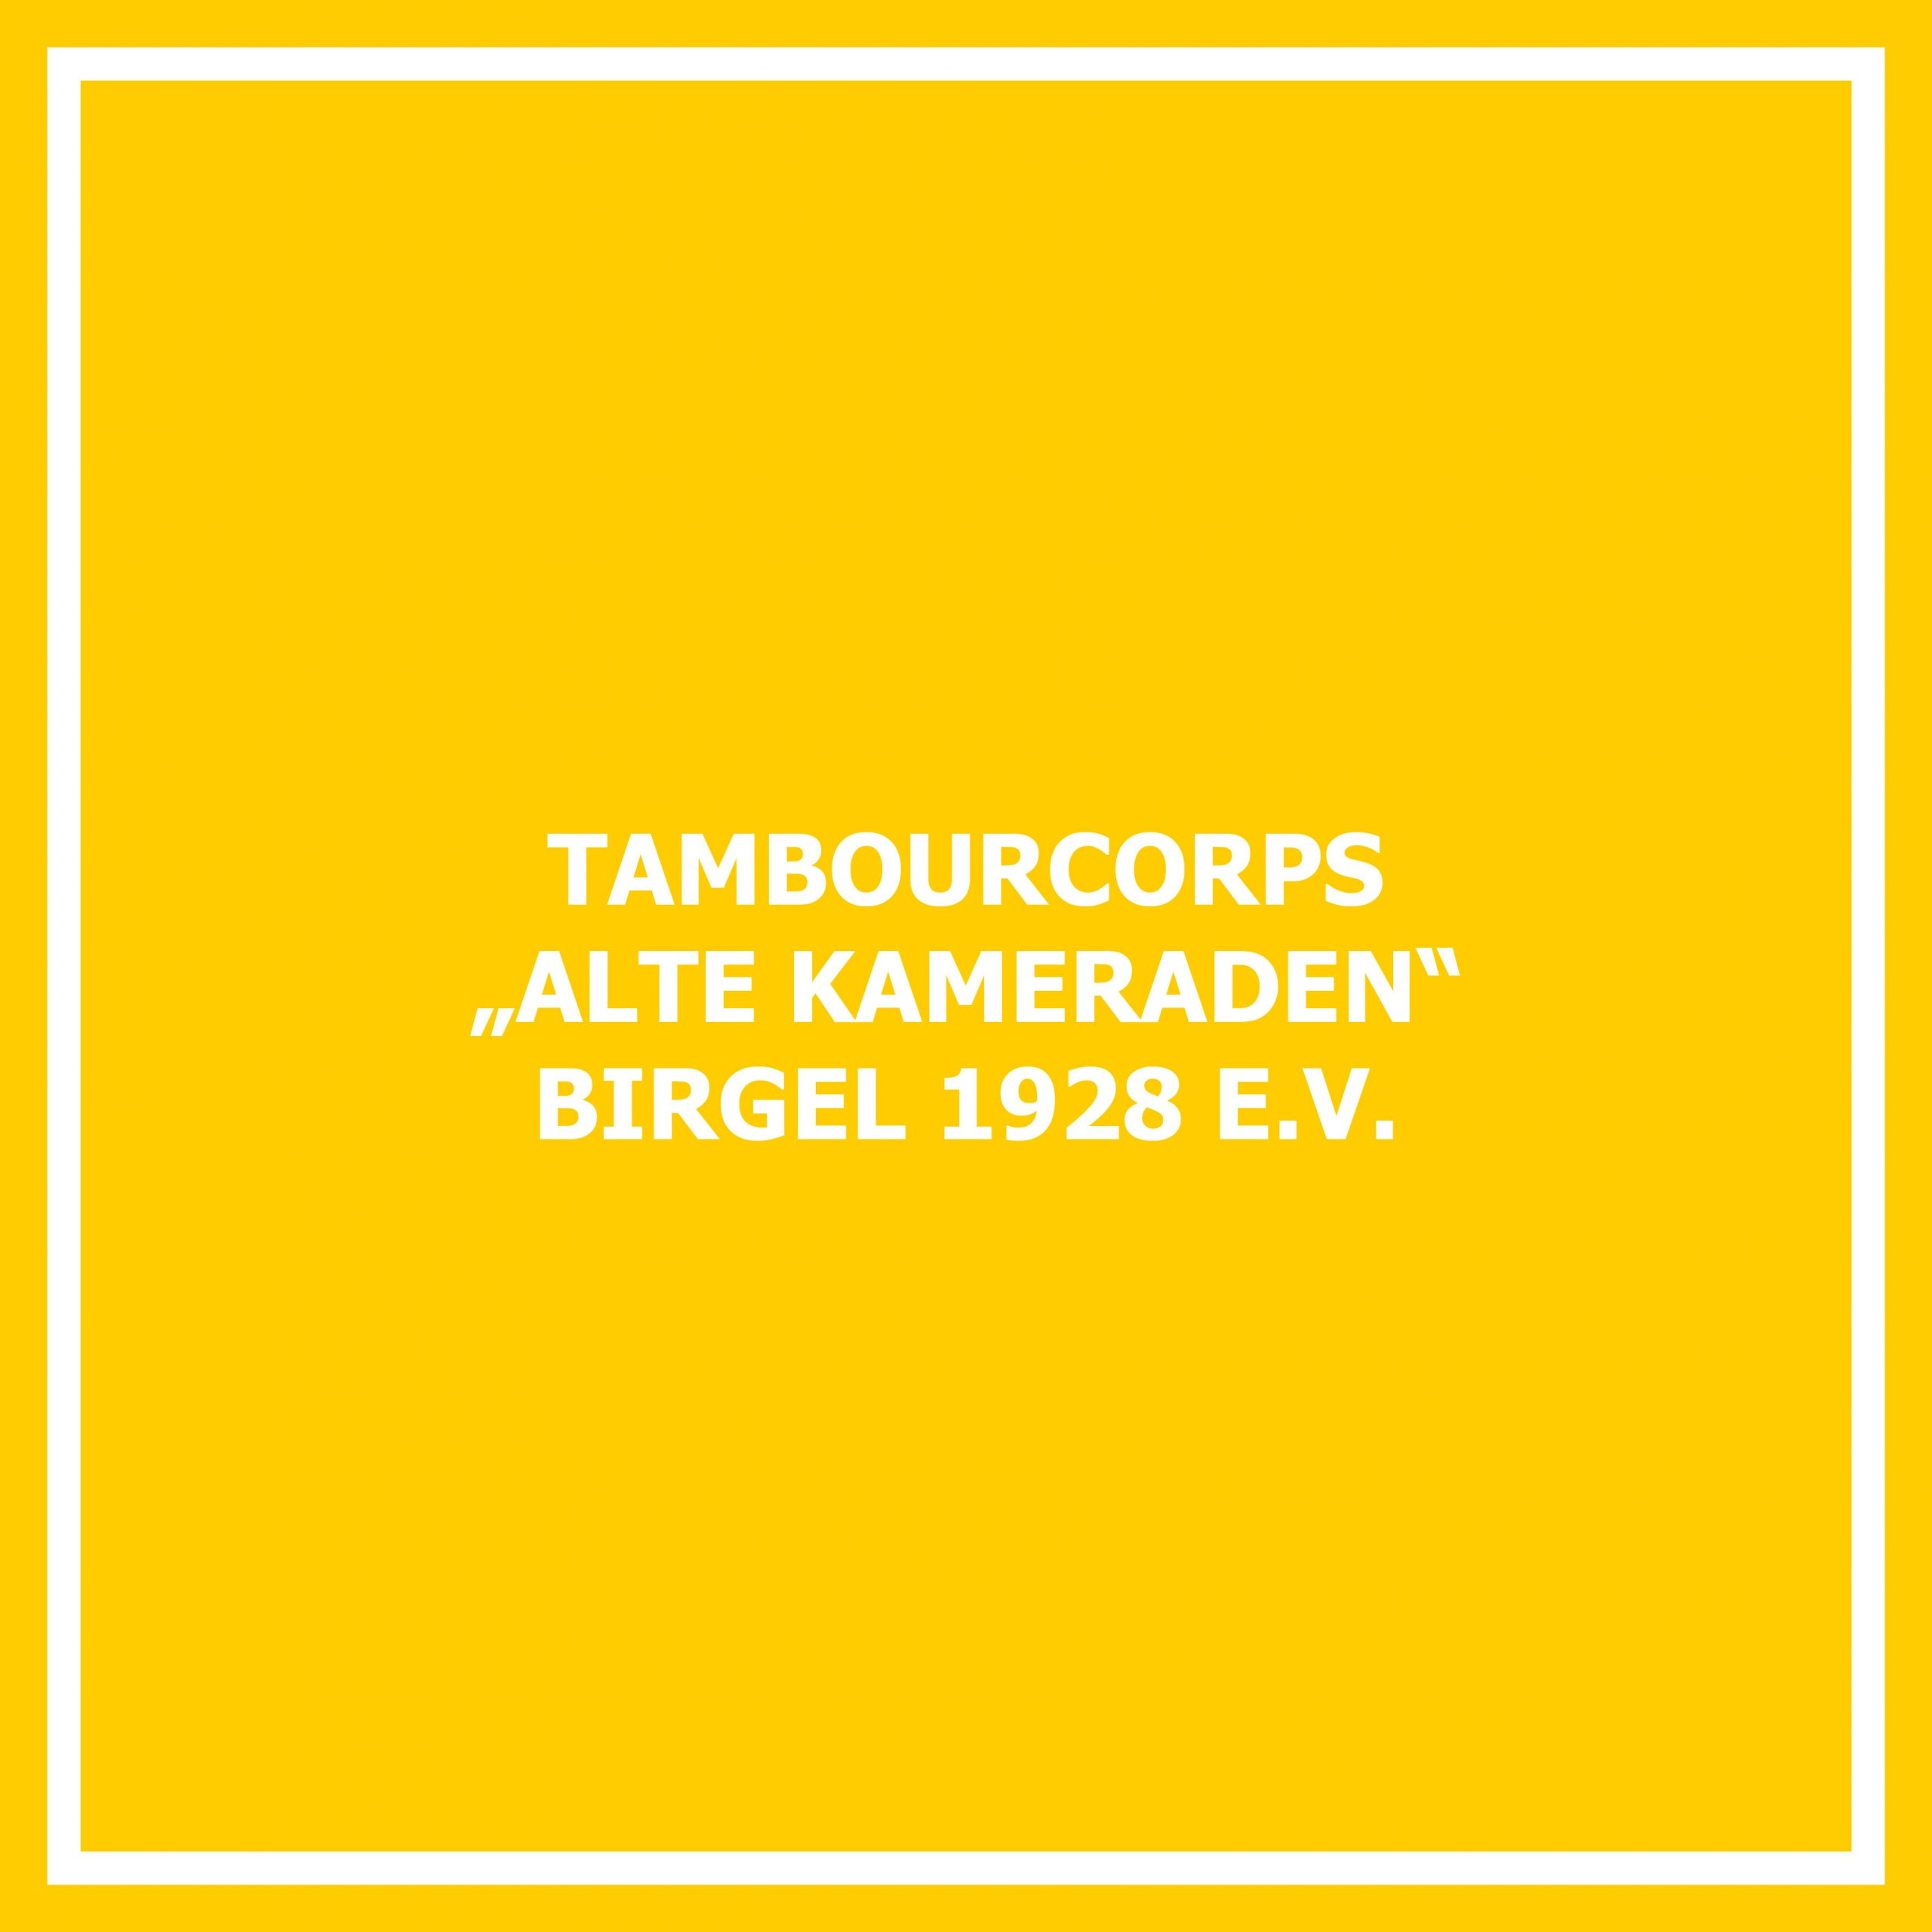 Tambourcorps Alte Kameraden Birgel 1928 e. V.